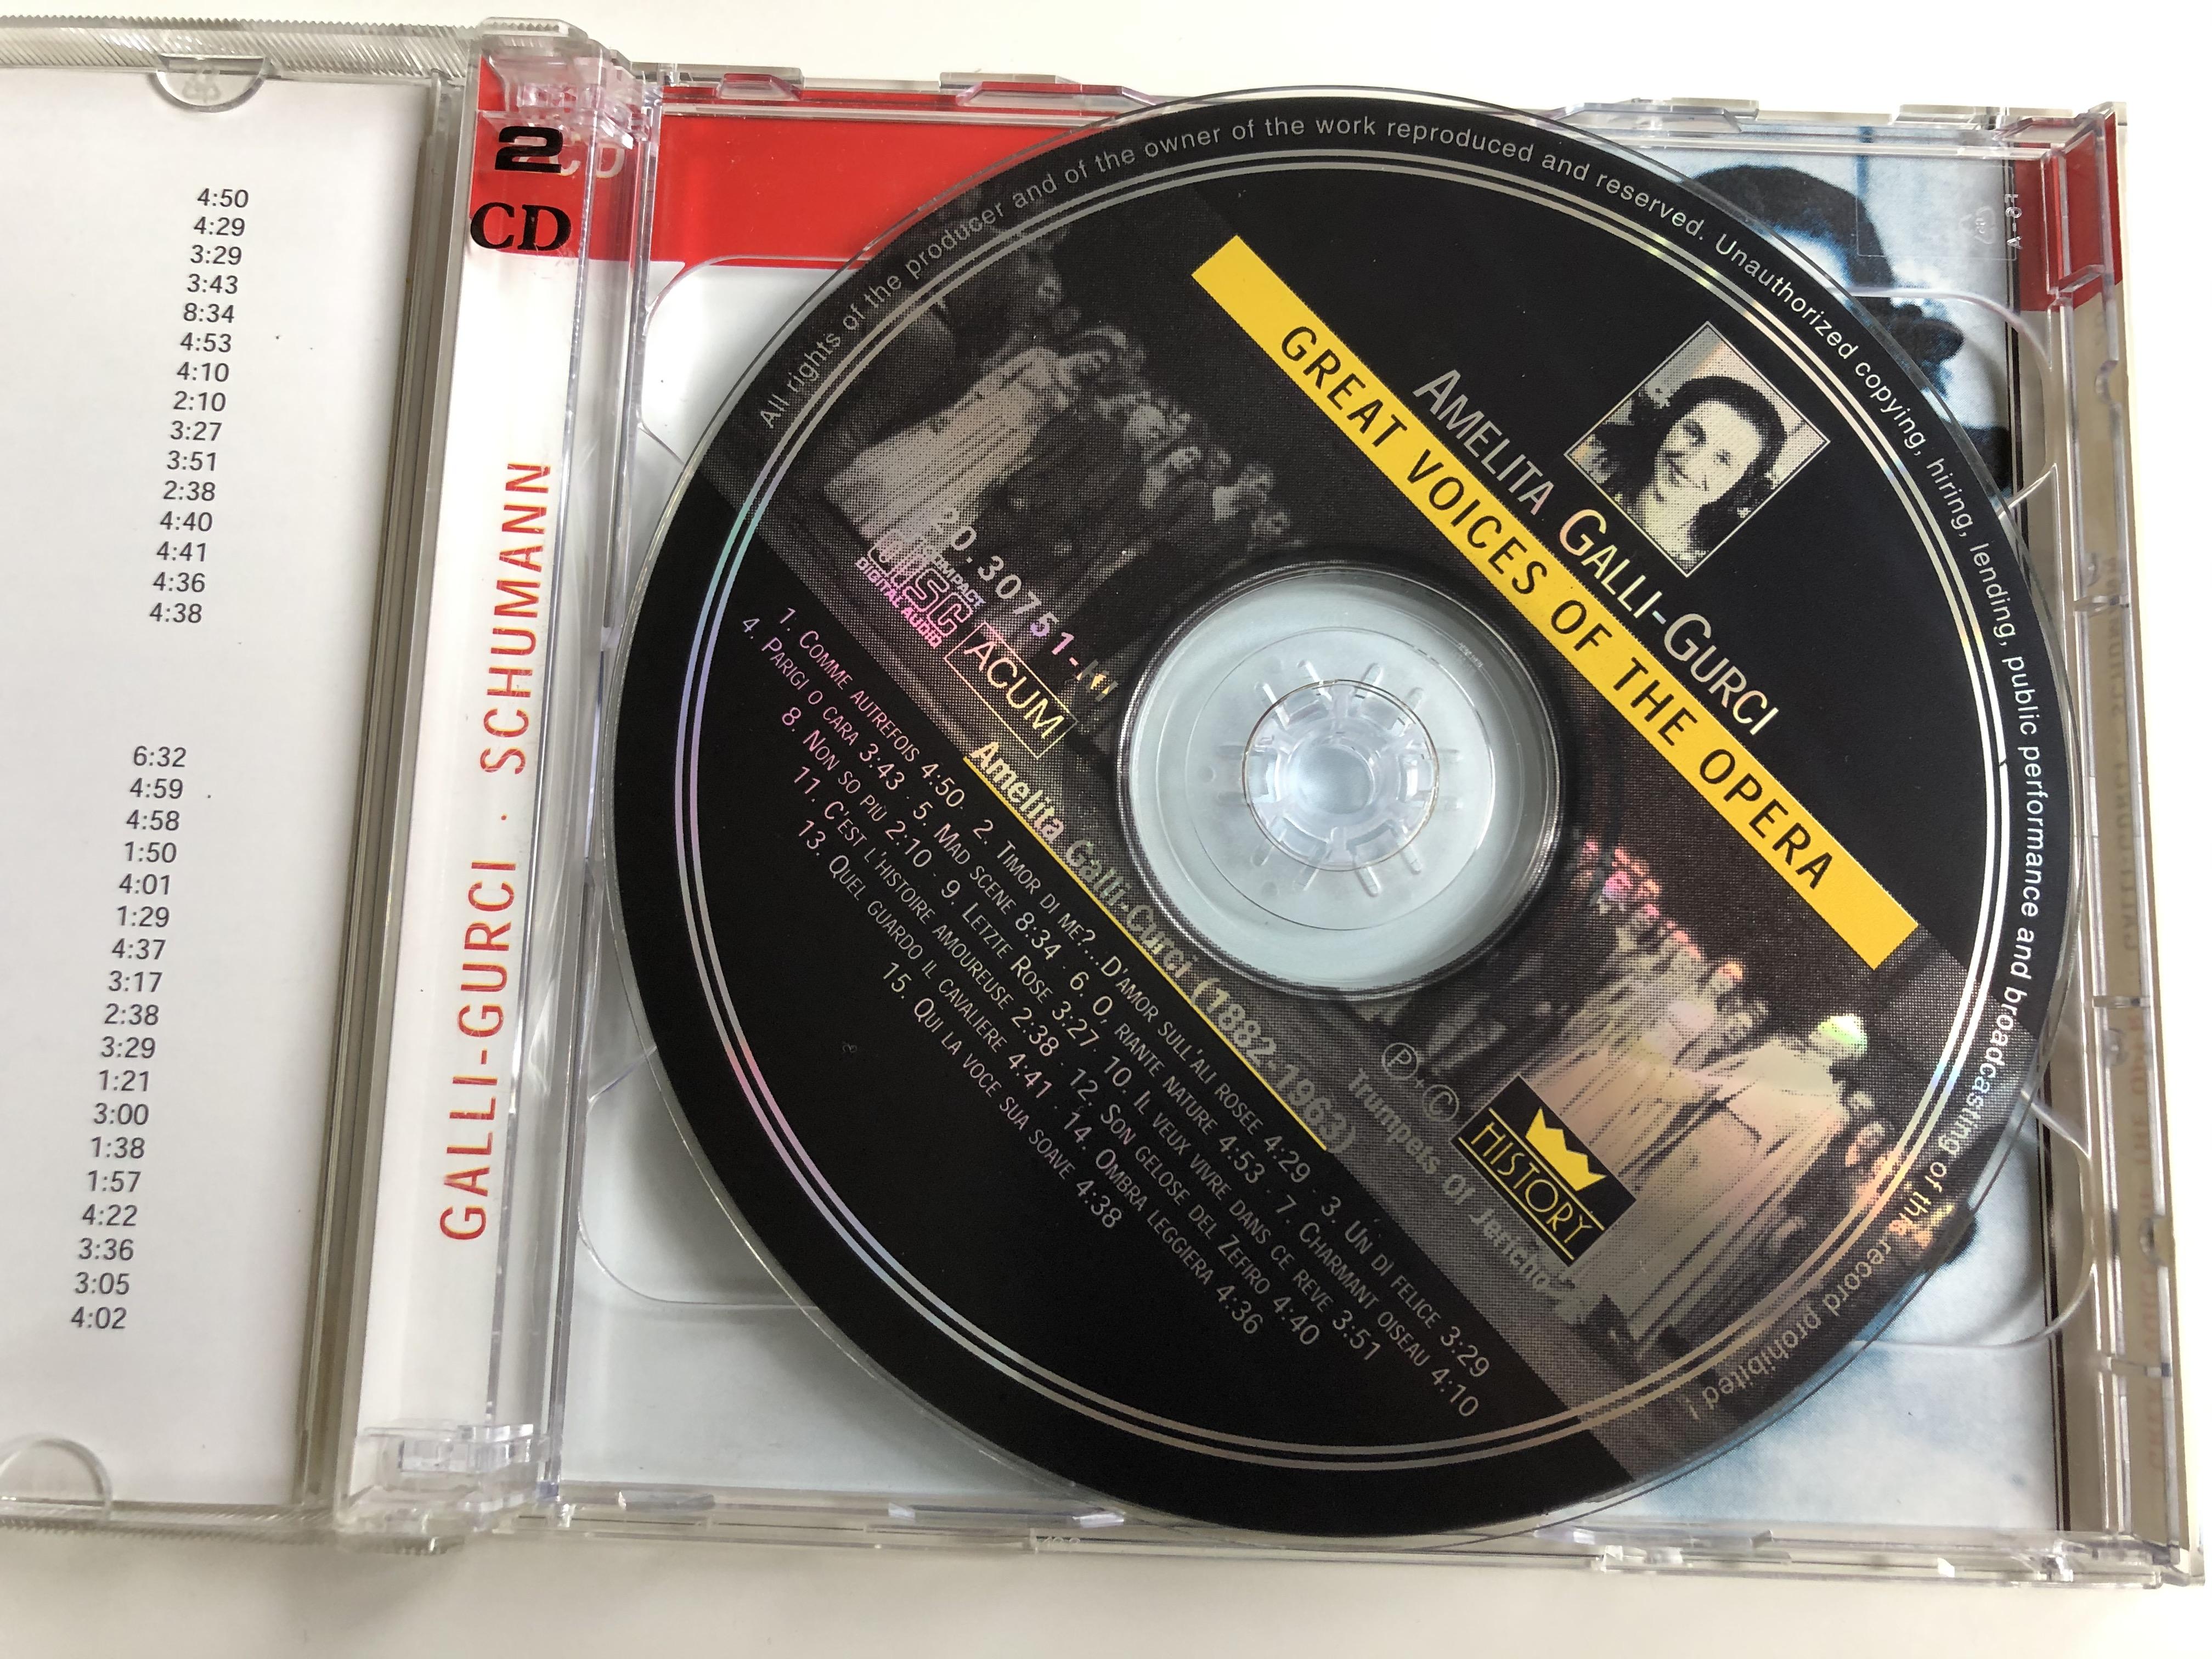 great-voices-of-the-opera-amelita-galli-gurci-elisabeth-schumann-history-2x-audio-cd-20-7-.jpg